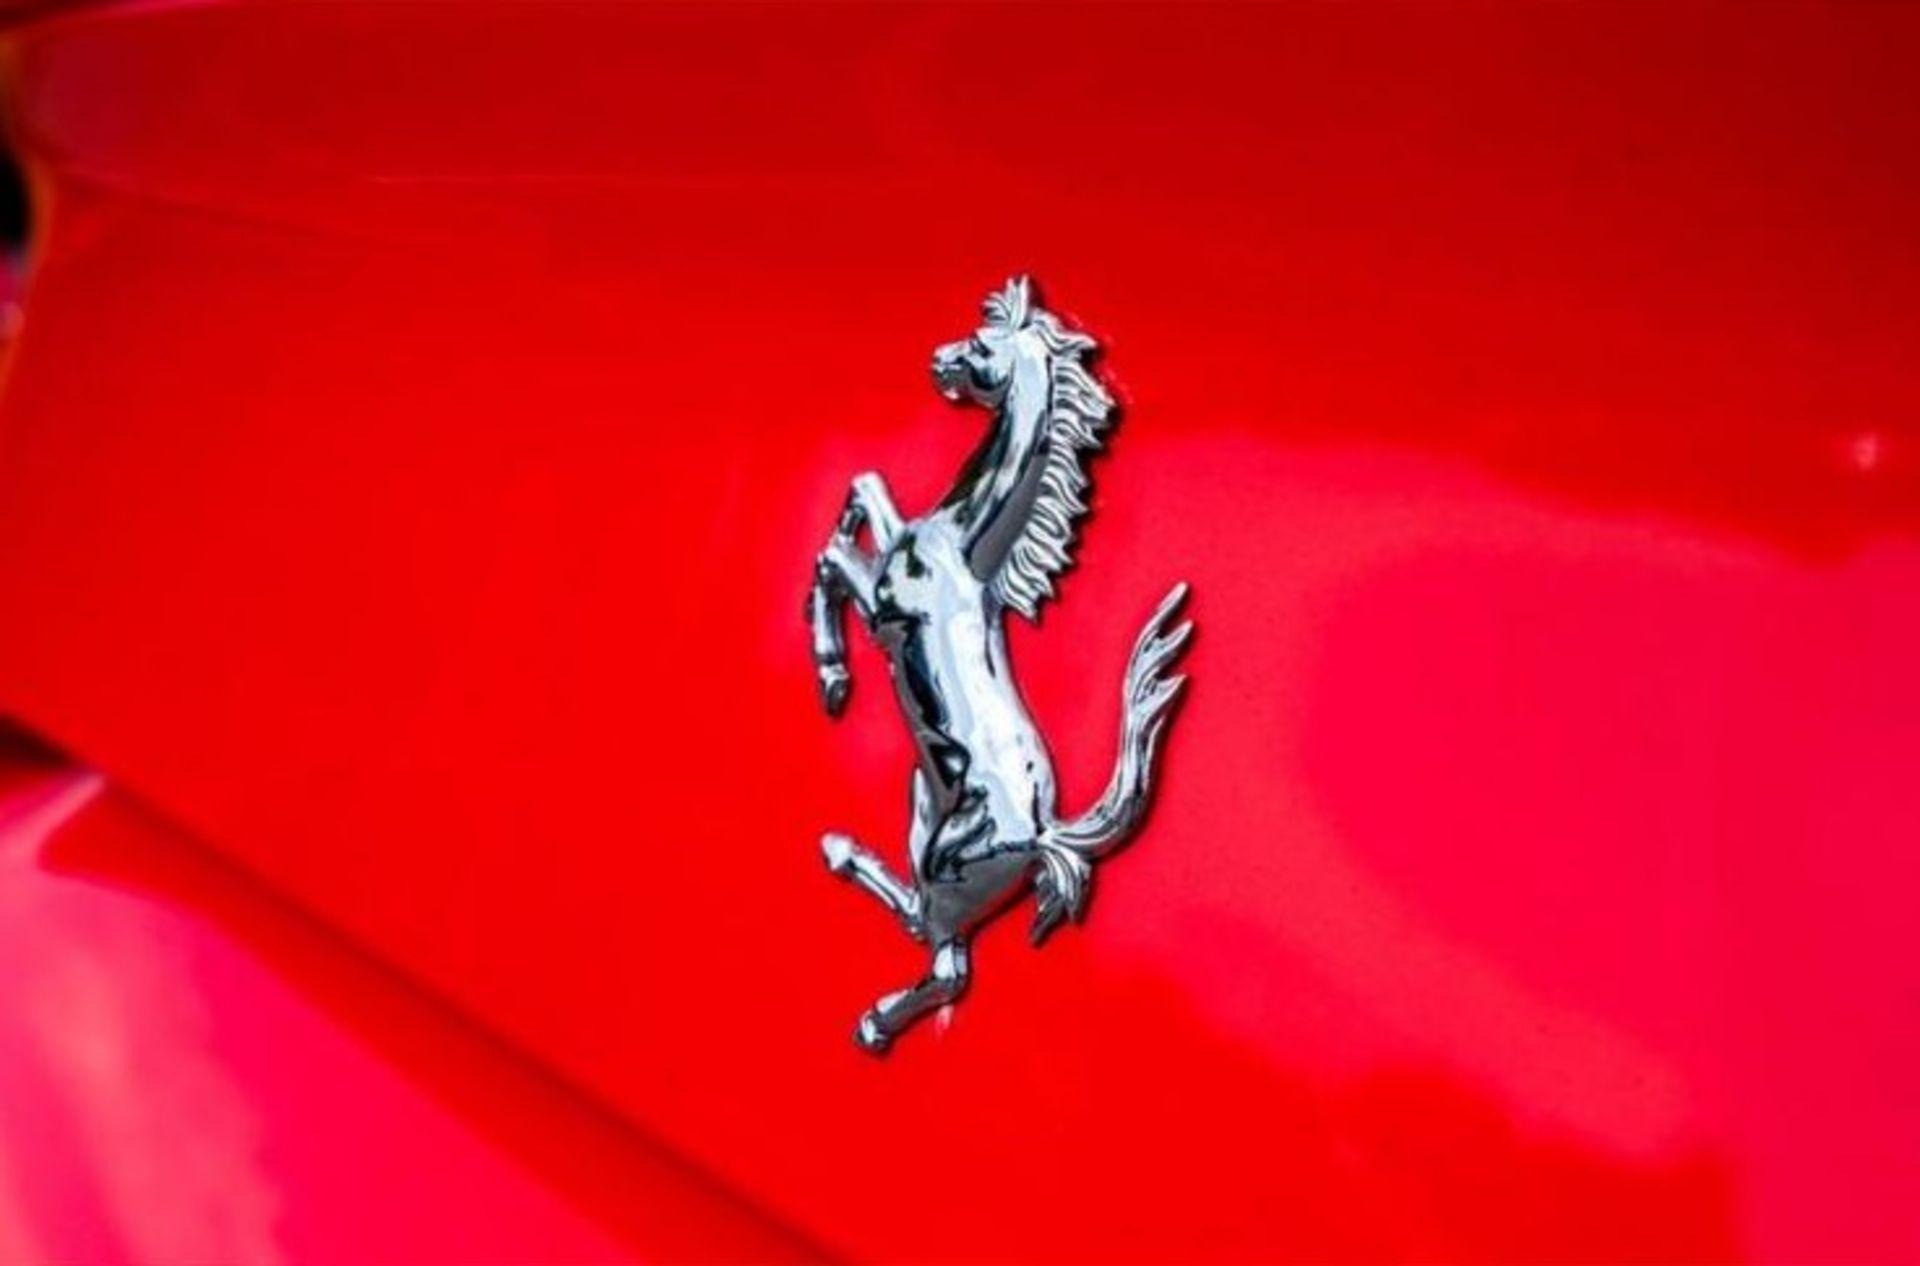 2016 FERRARI 488 GTB 2DR RED COUPE, PETROL, AUTOMATIC, 11K MILES, LEFT HAND DRIVE *NO VAT* - Image 15 of 22